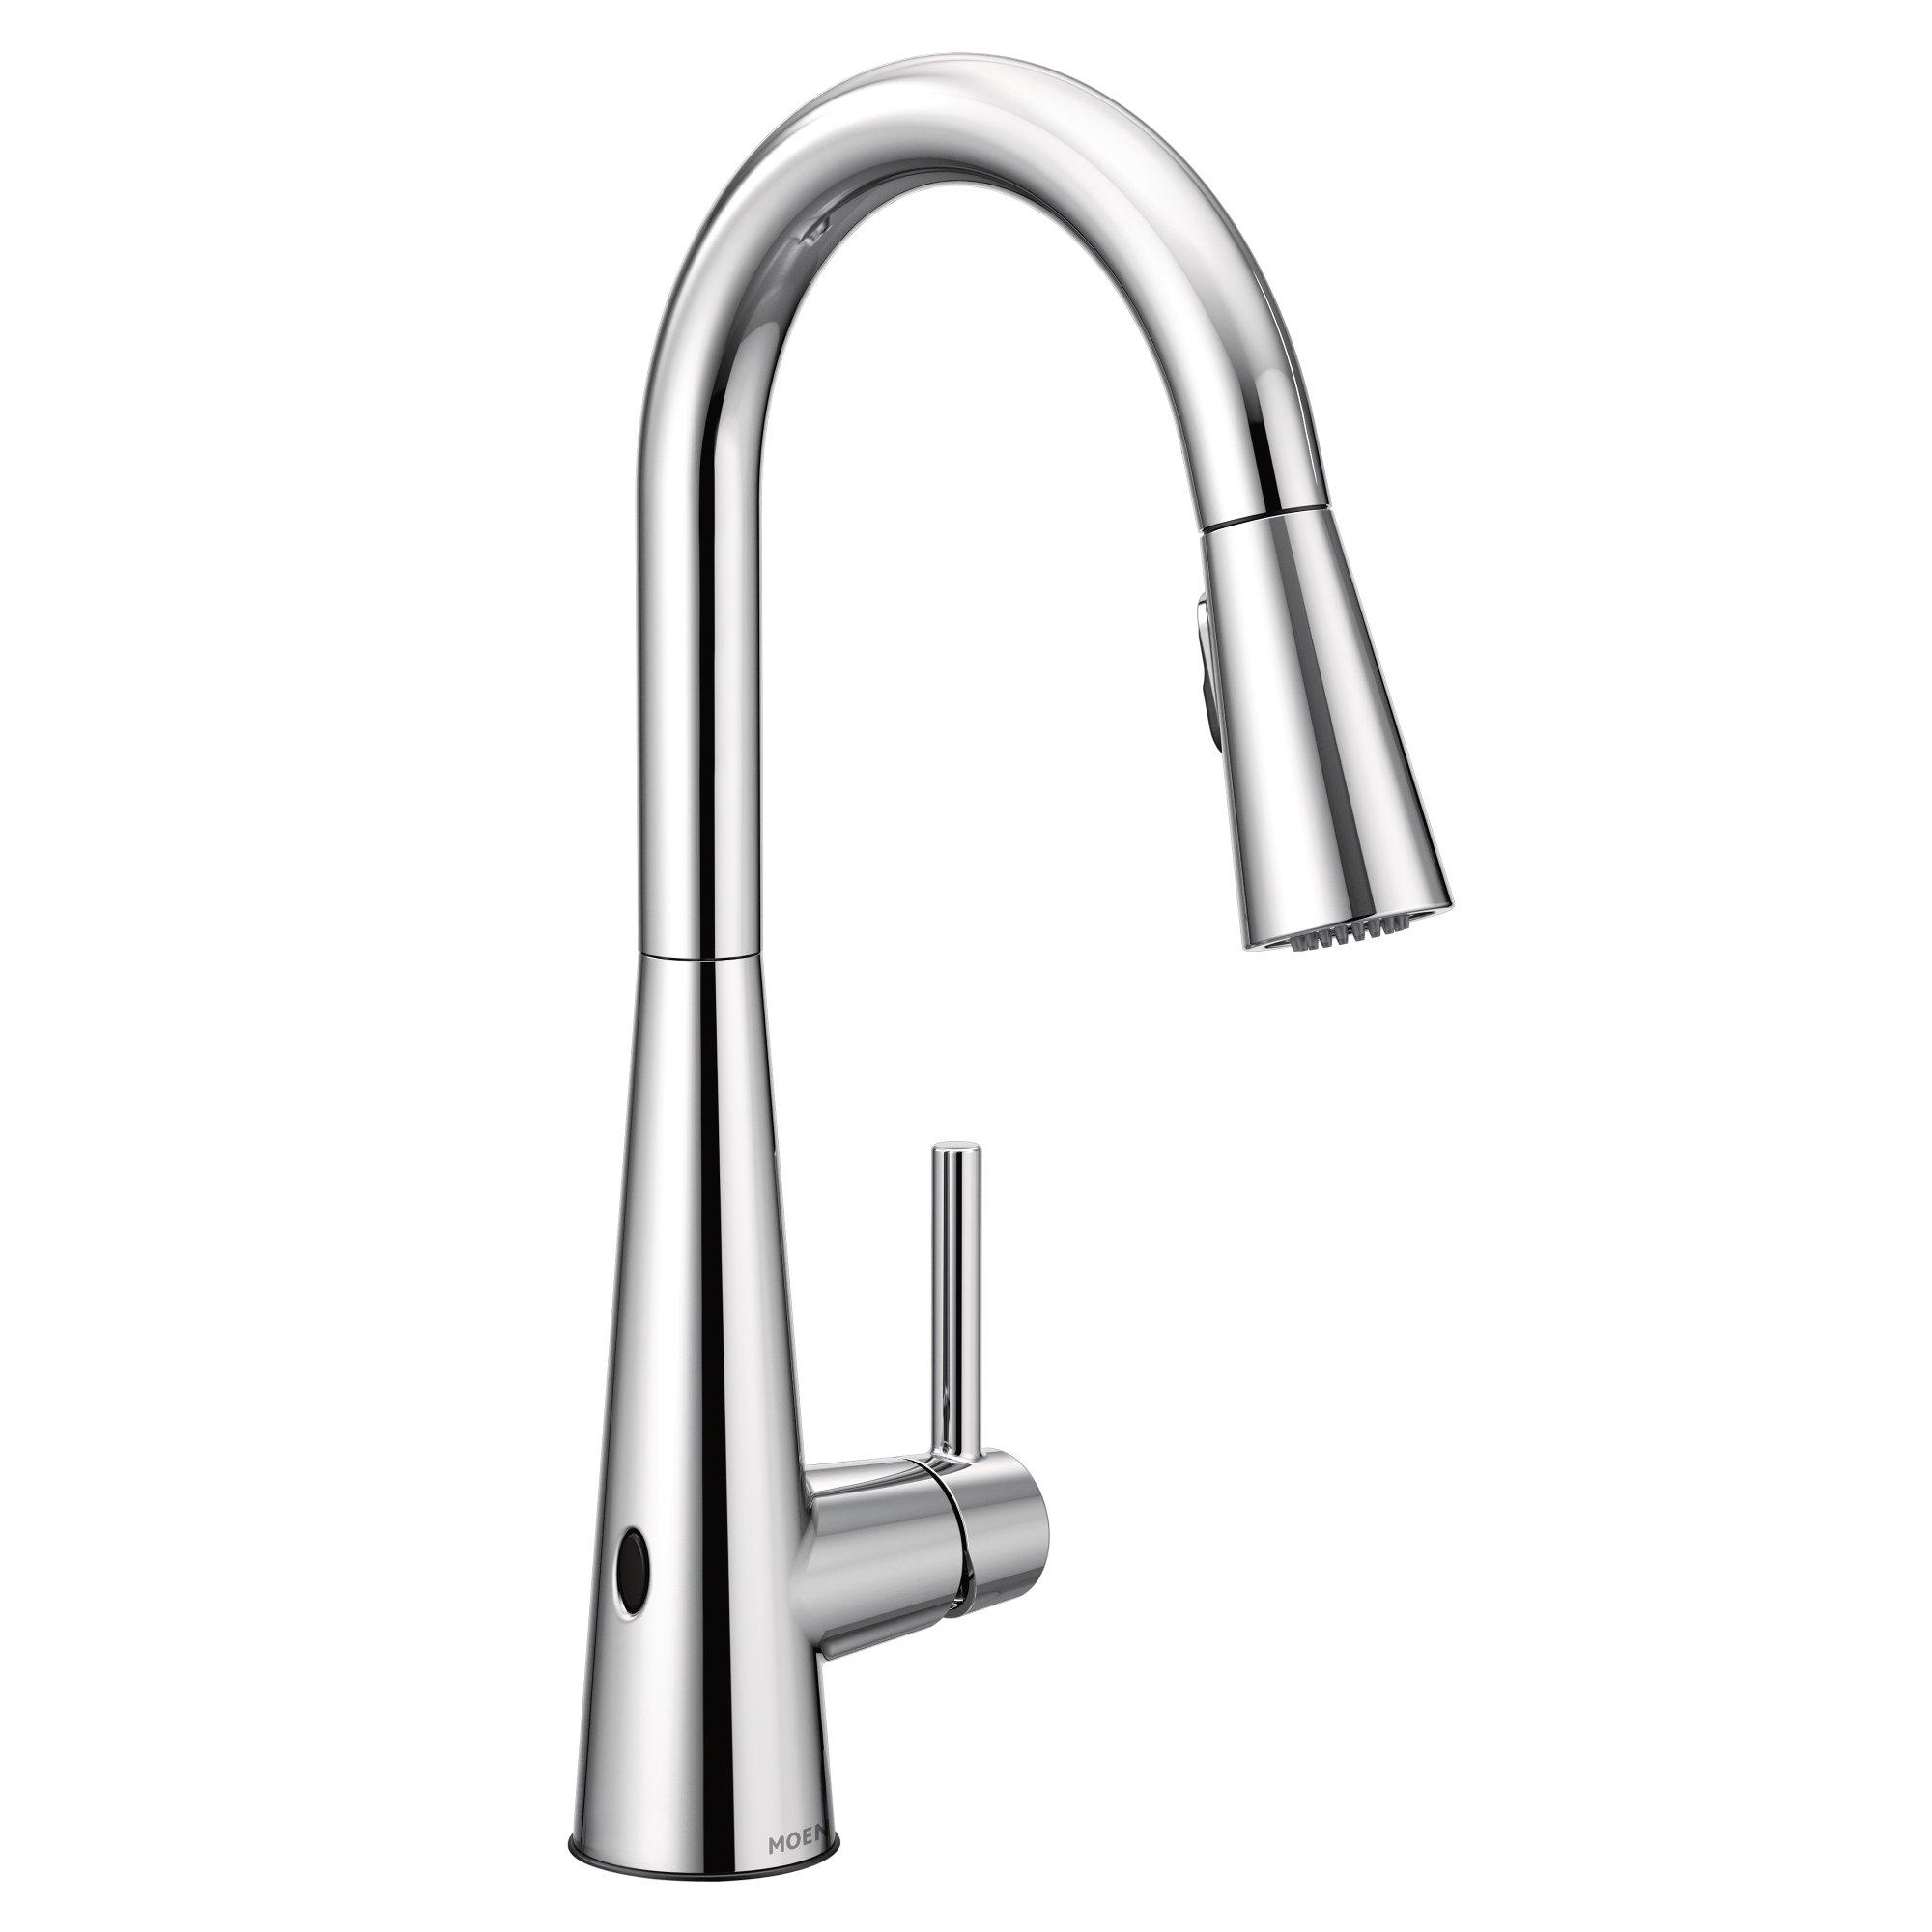 Moen 7864EWC Sleek Motionsense Wave Touchless One-Handle High Arc Pulldown Kitchen Faucet Featuring Reflex, Chrome (7594EWC) by Moen